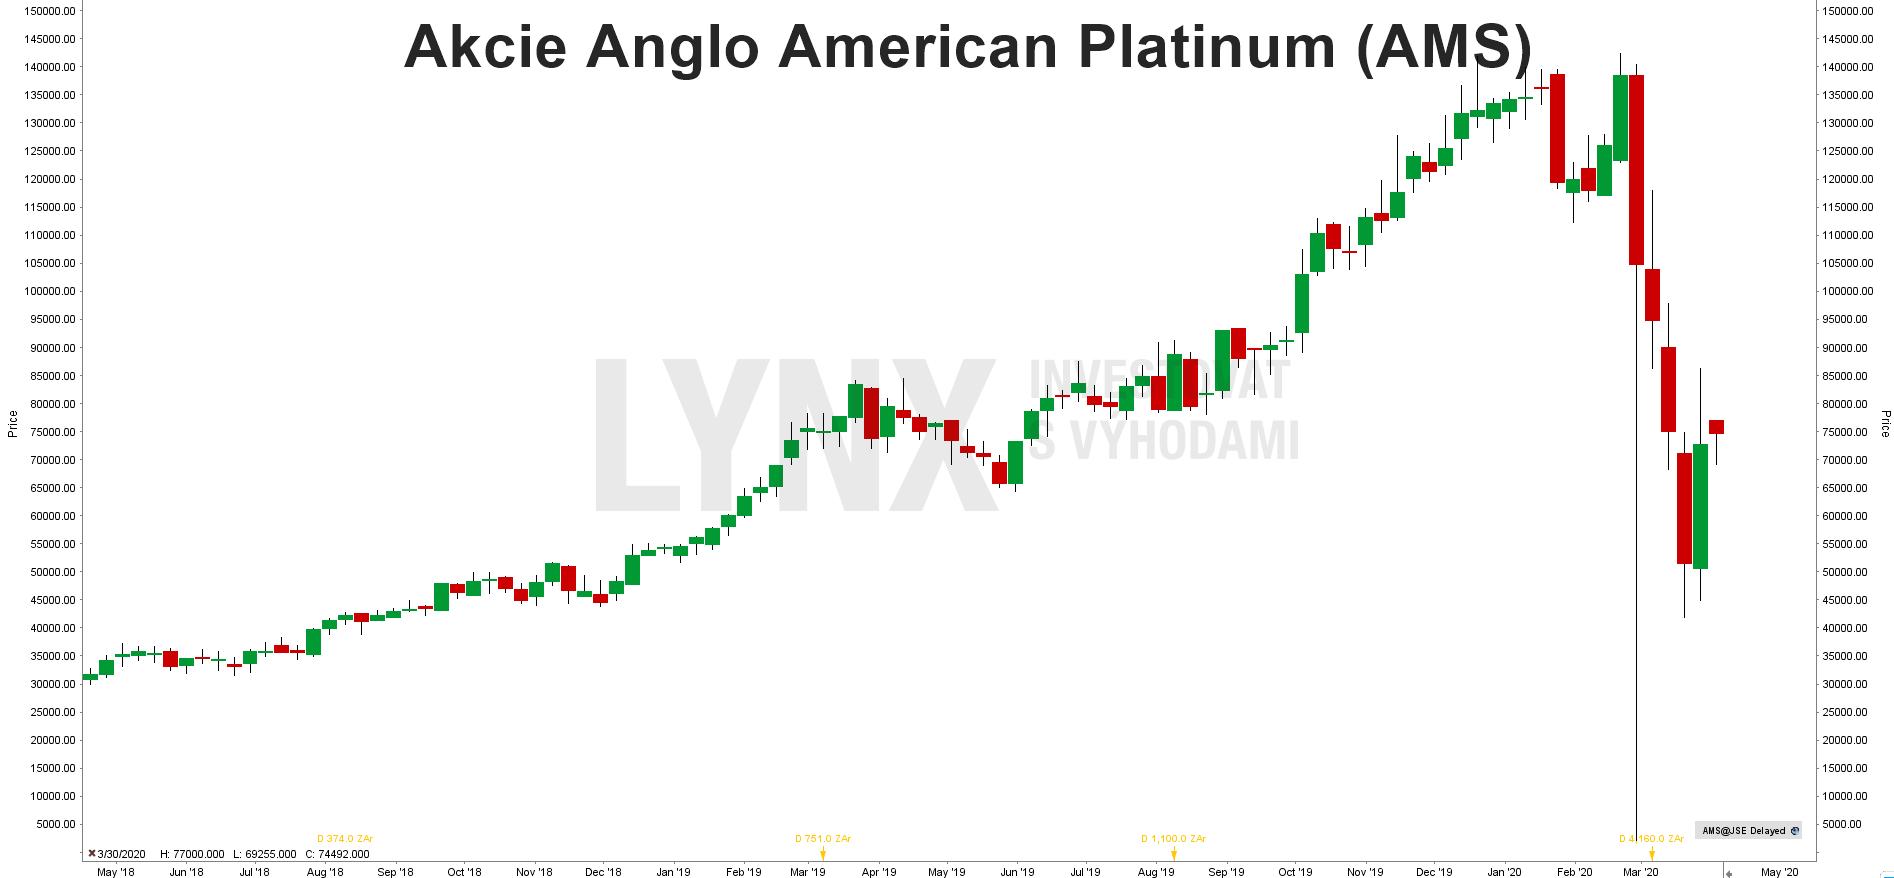 Graf akcie Anglo American Platinum (AMS)